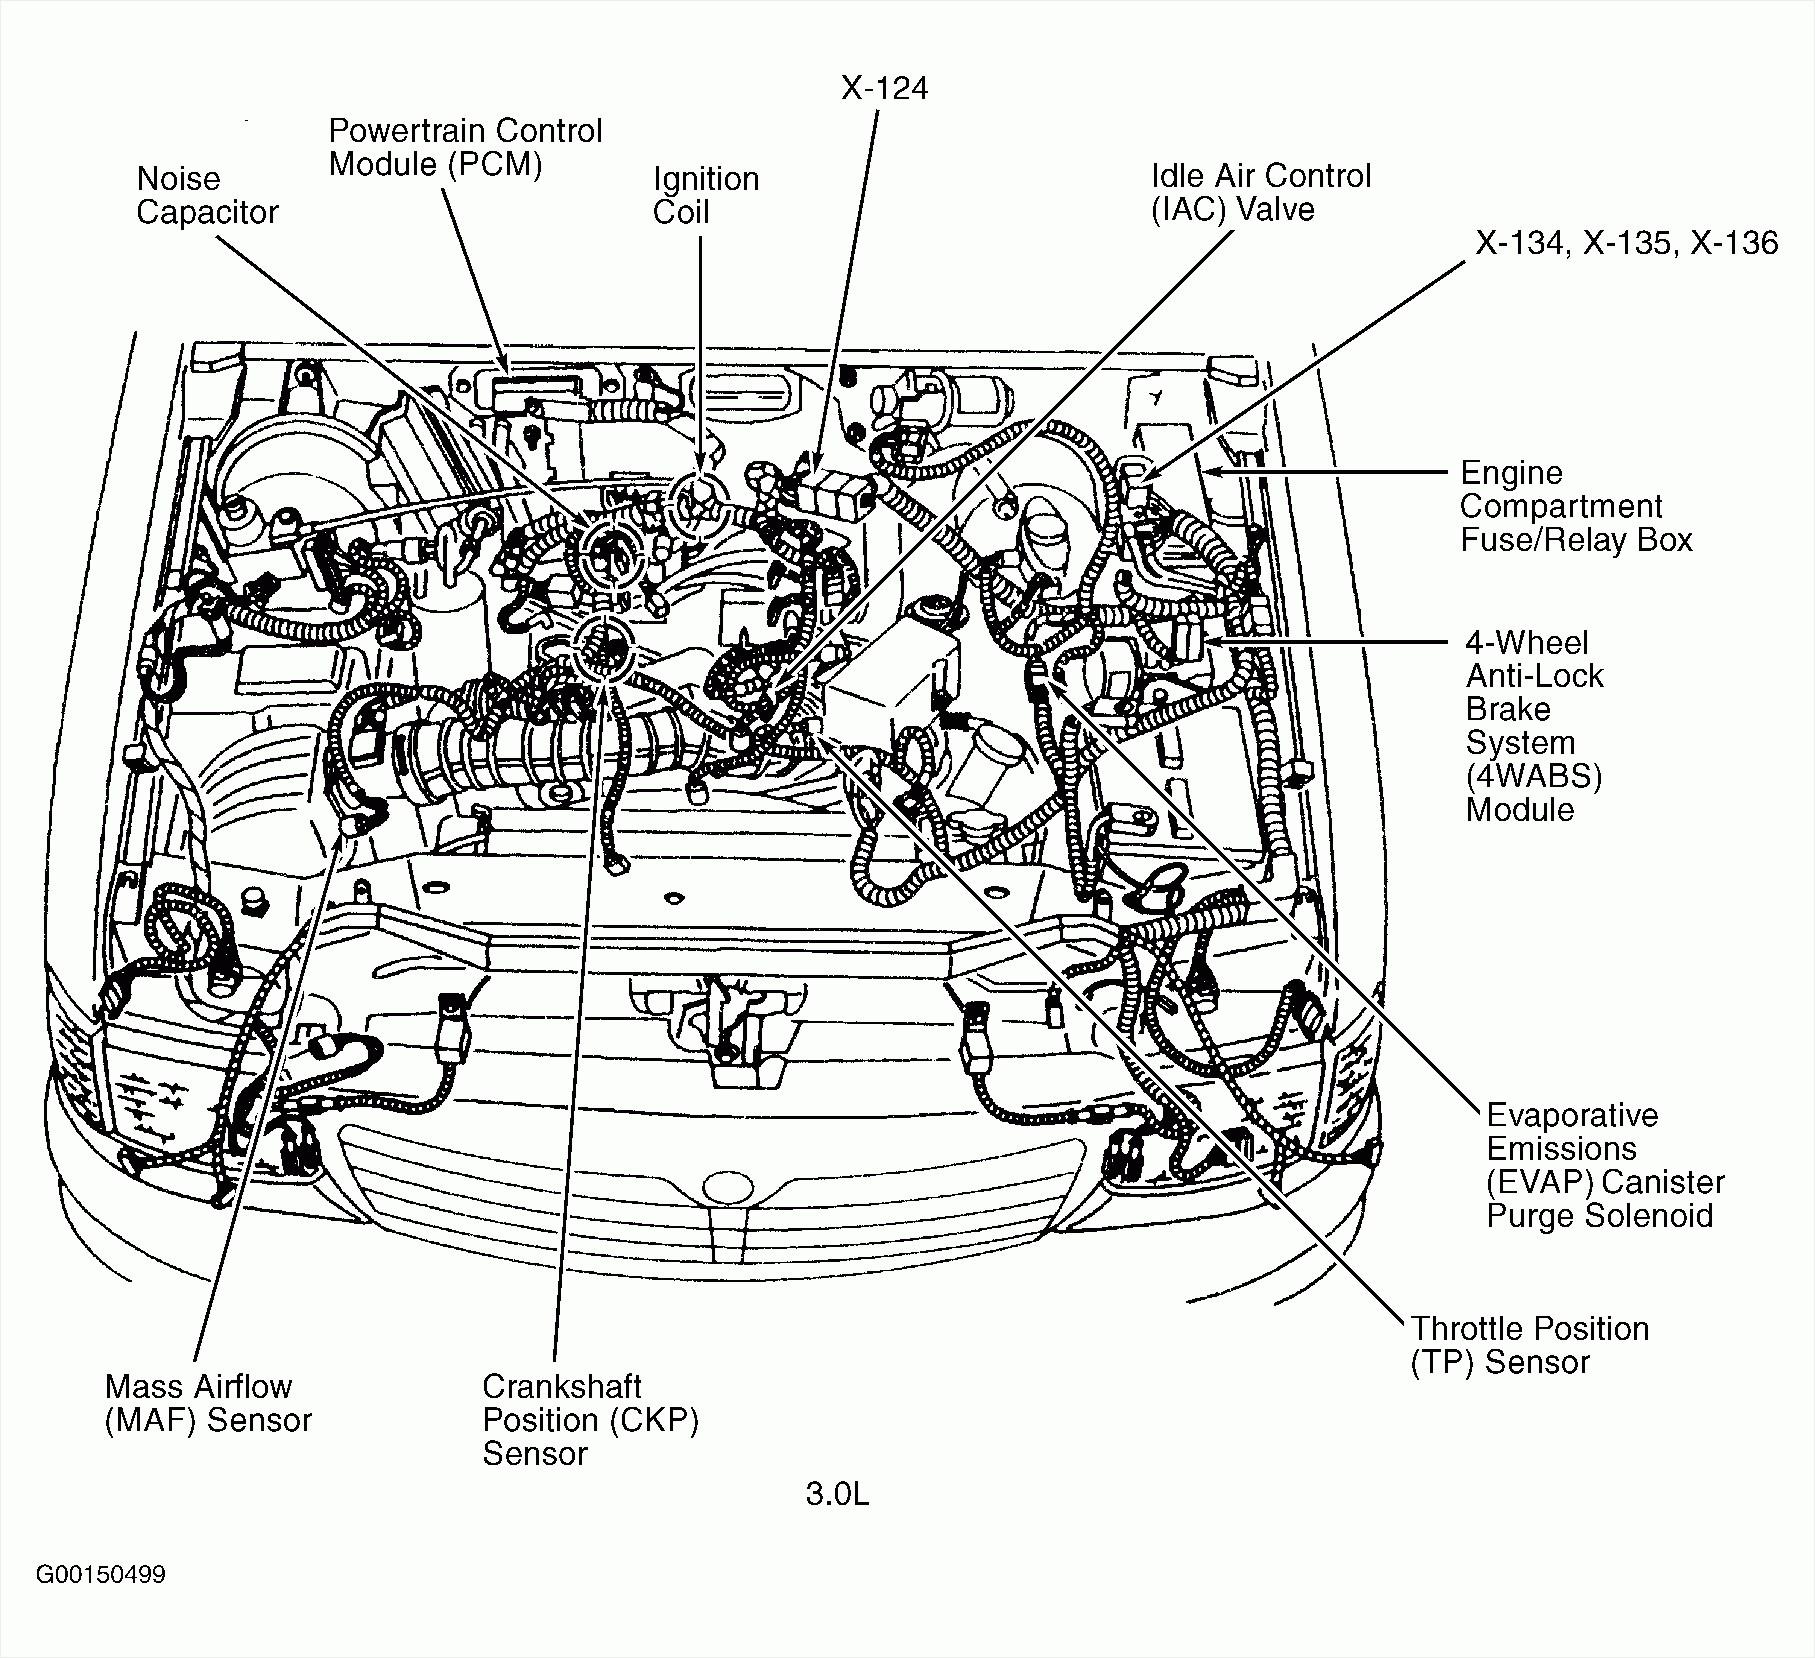 2006 explorer engine diagram wiring diagram dash 2008 ford explorer engine diagram explorer engine diagram #10